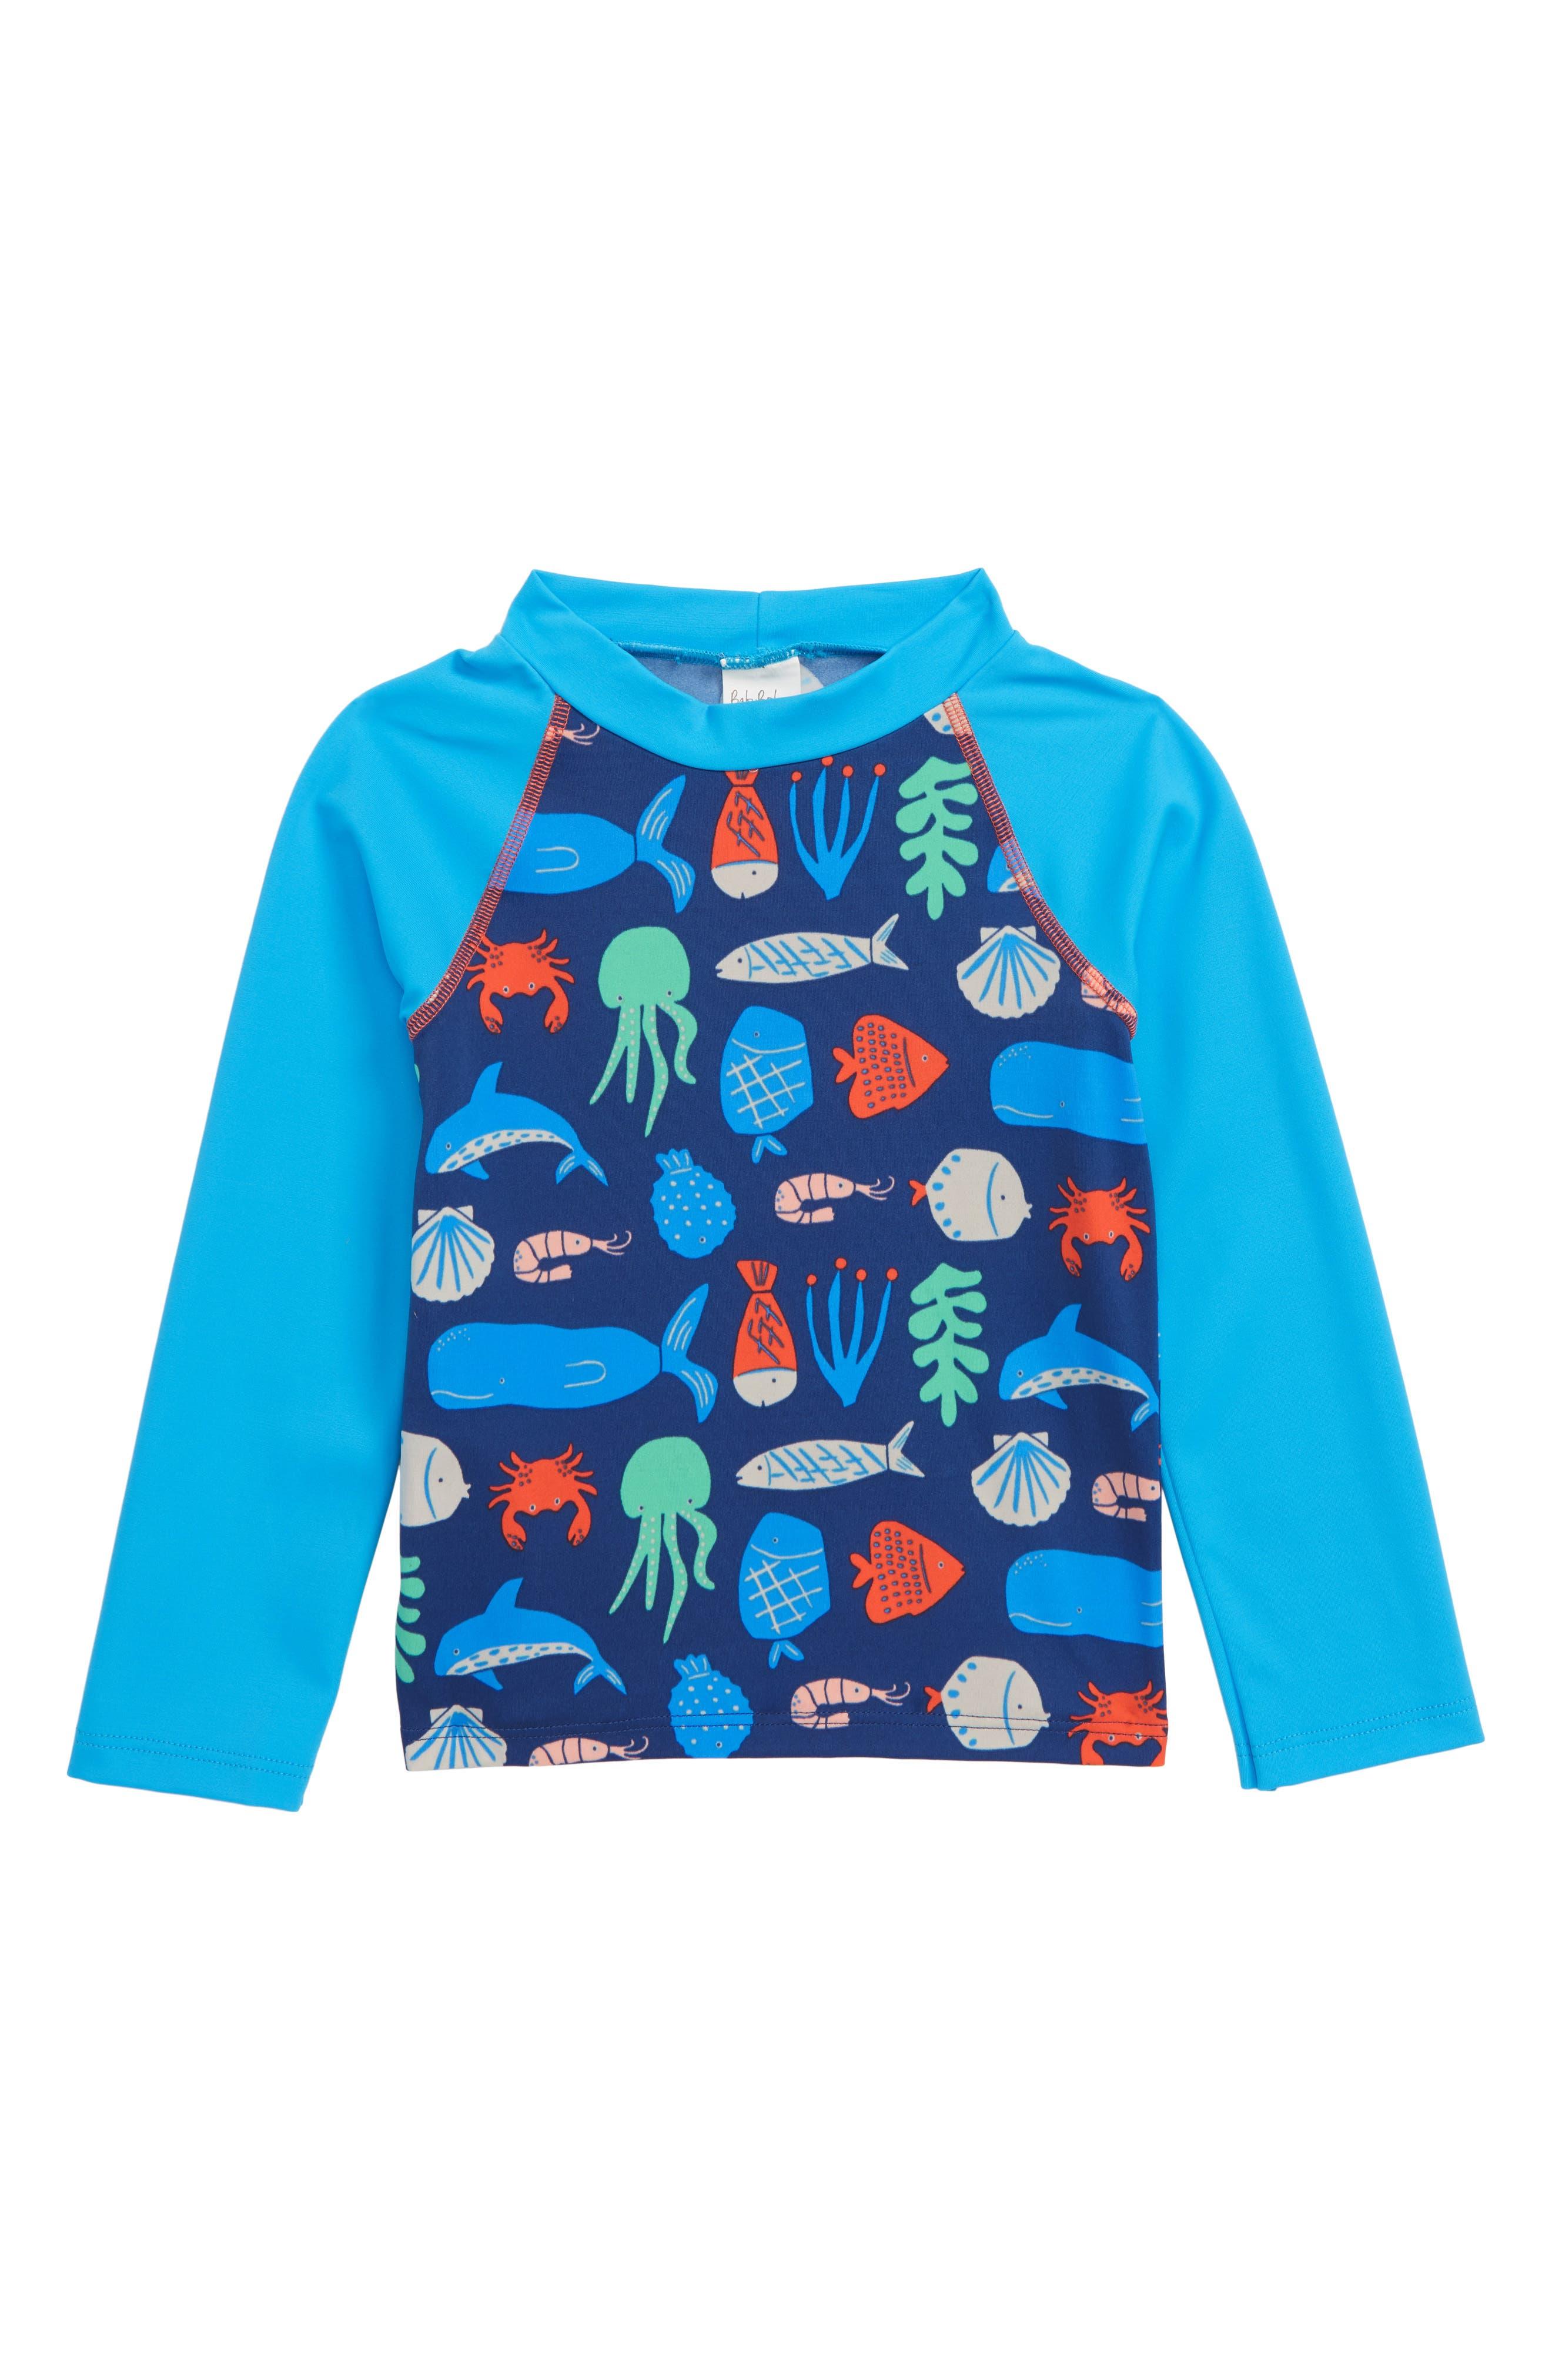 Toddler Boys Mini Boden Long Sleeve Rashguard